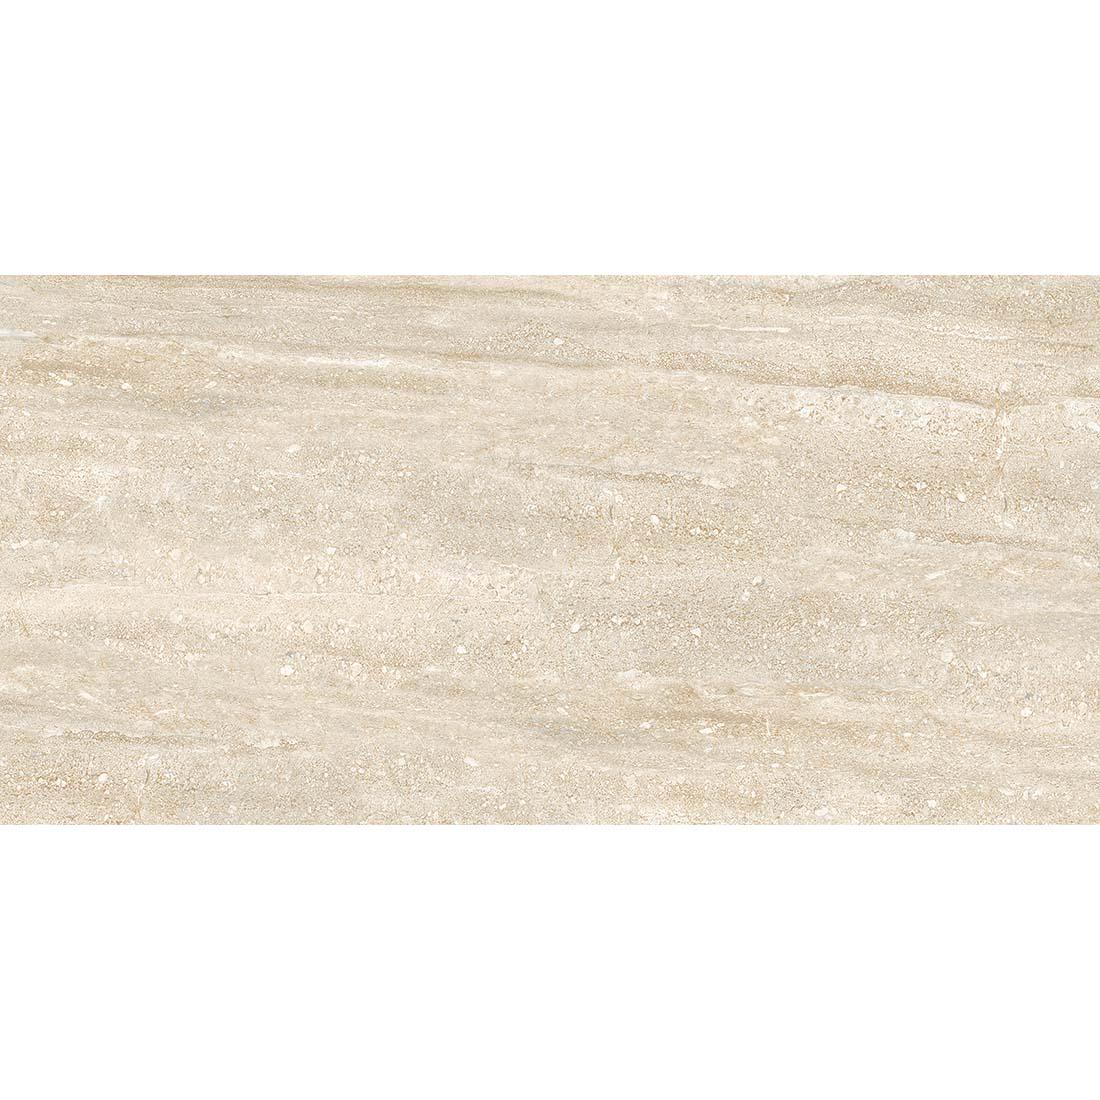 Clasico 25x50 Dark Beige Gloss 1